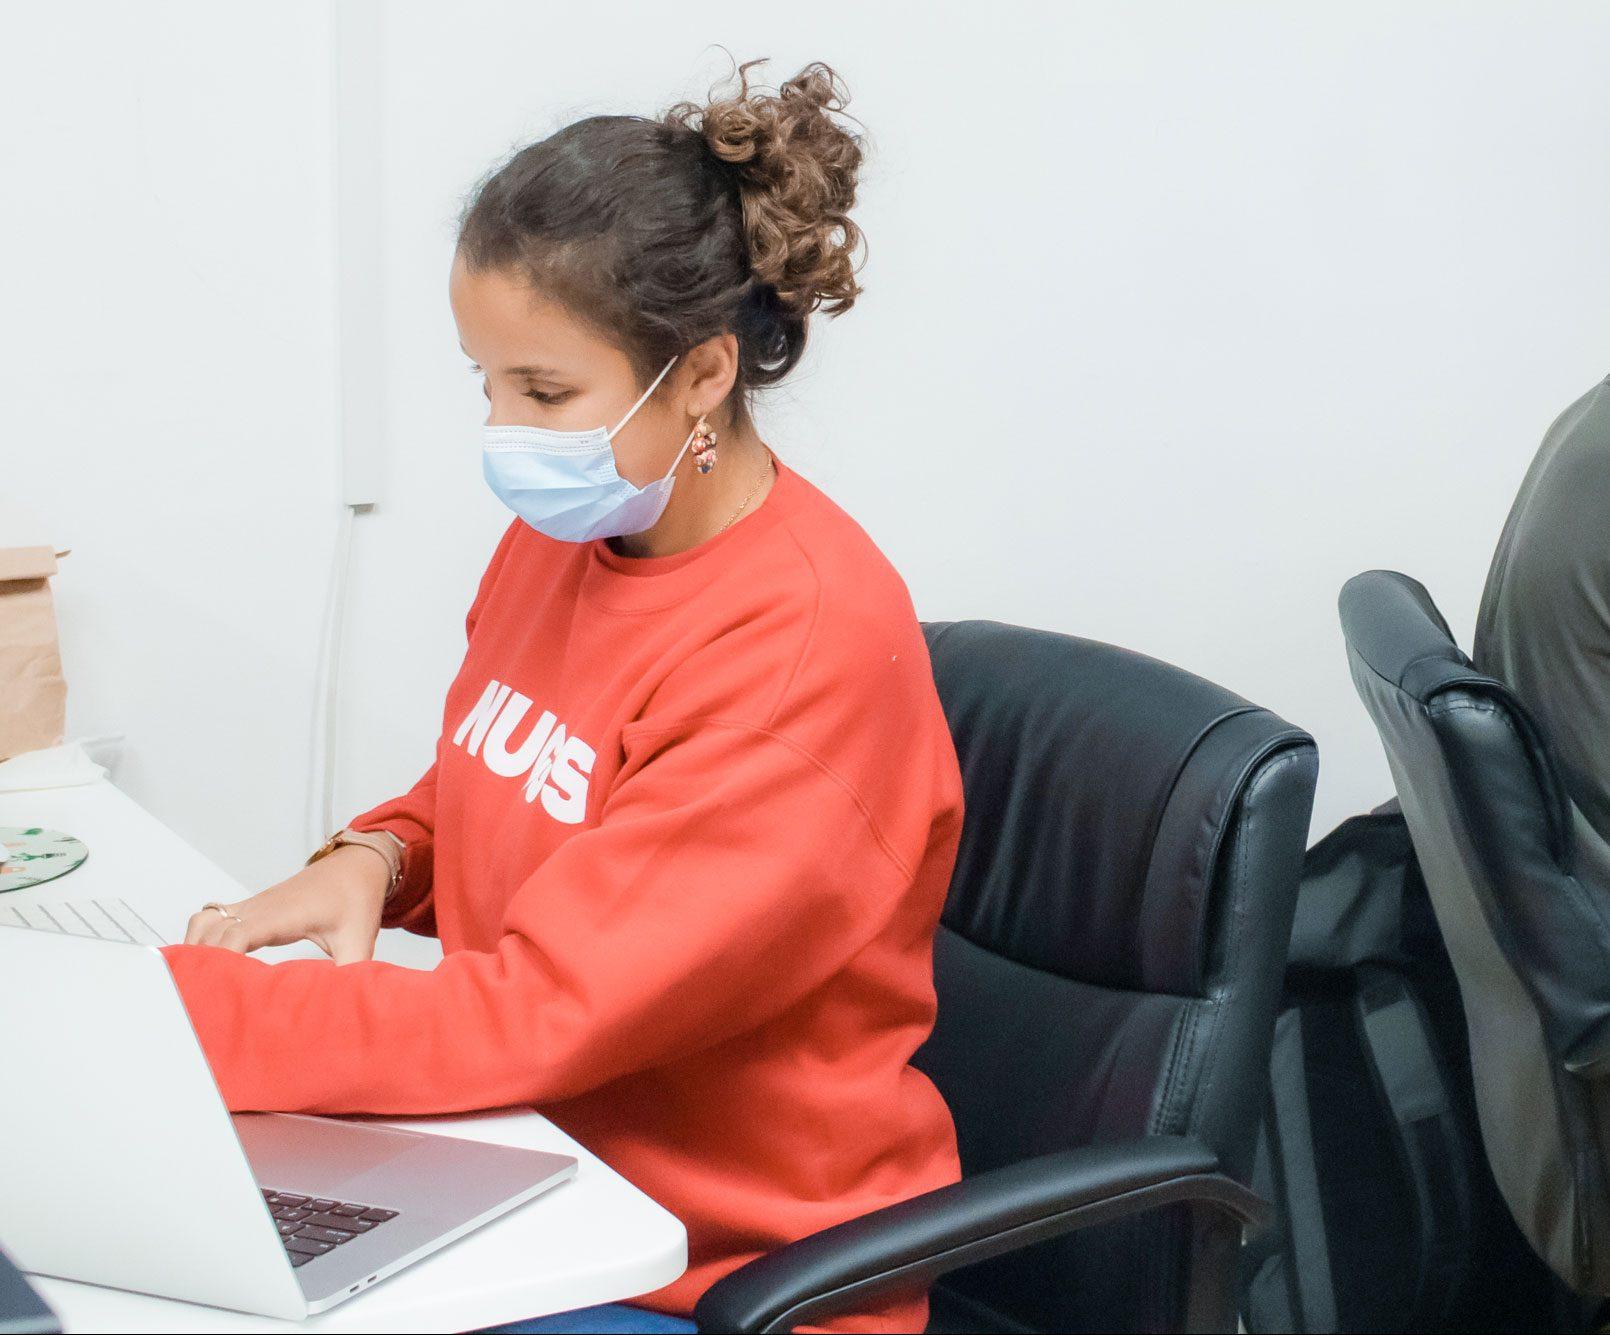 Gabriela, a Nuggs food engineer, working at her desk.